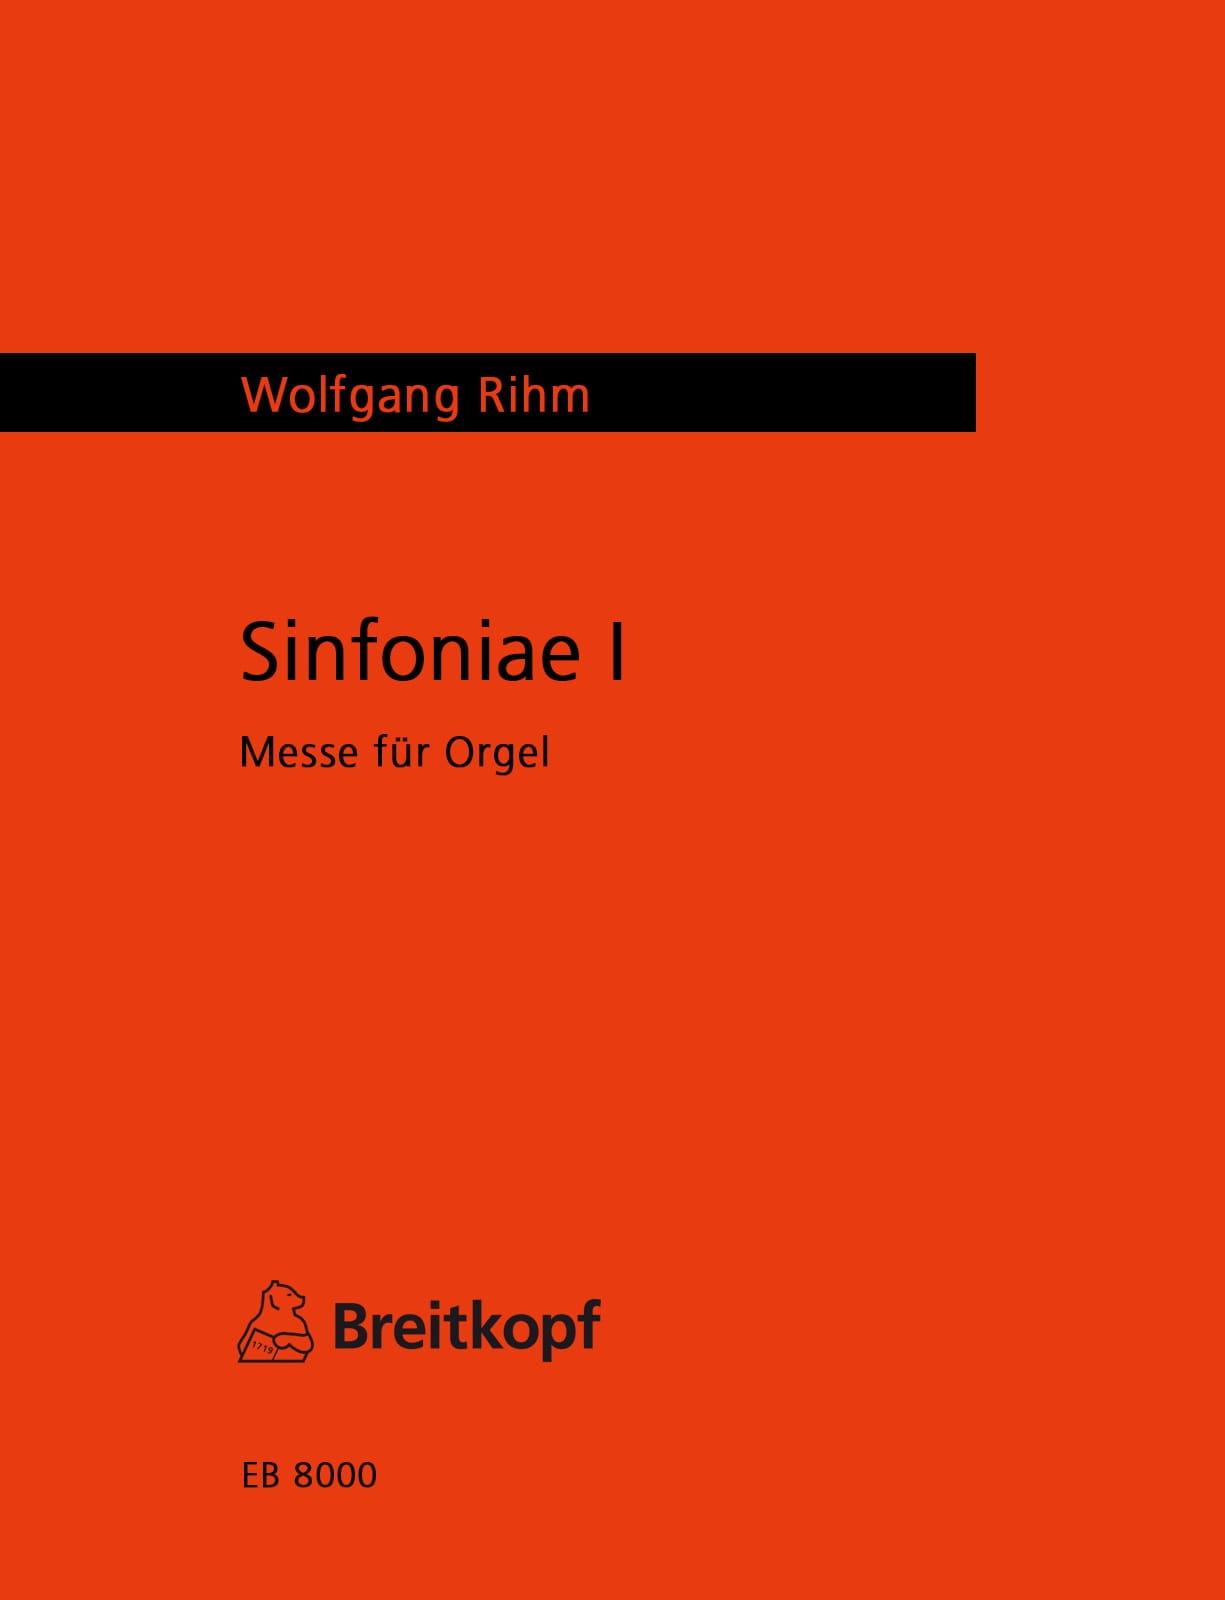 Sinfoniae I - Wolfgang Rihm - Partition - Orgue - laflutedepan.com